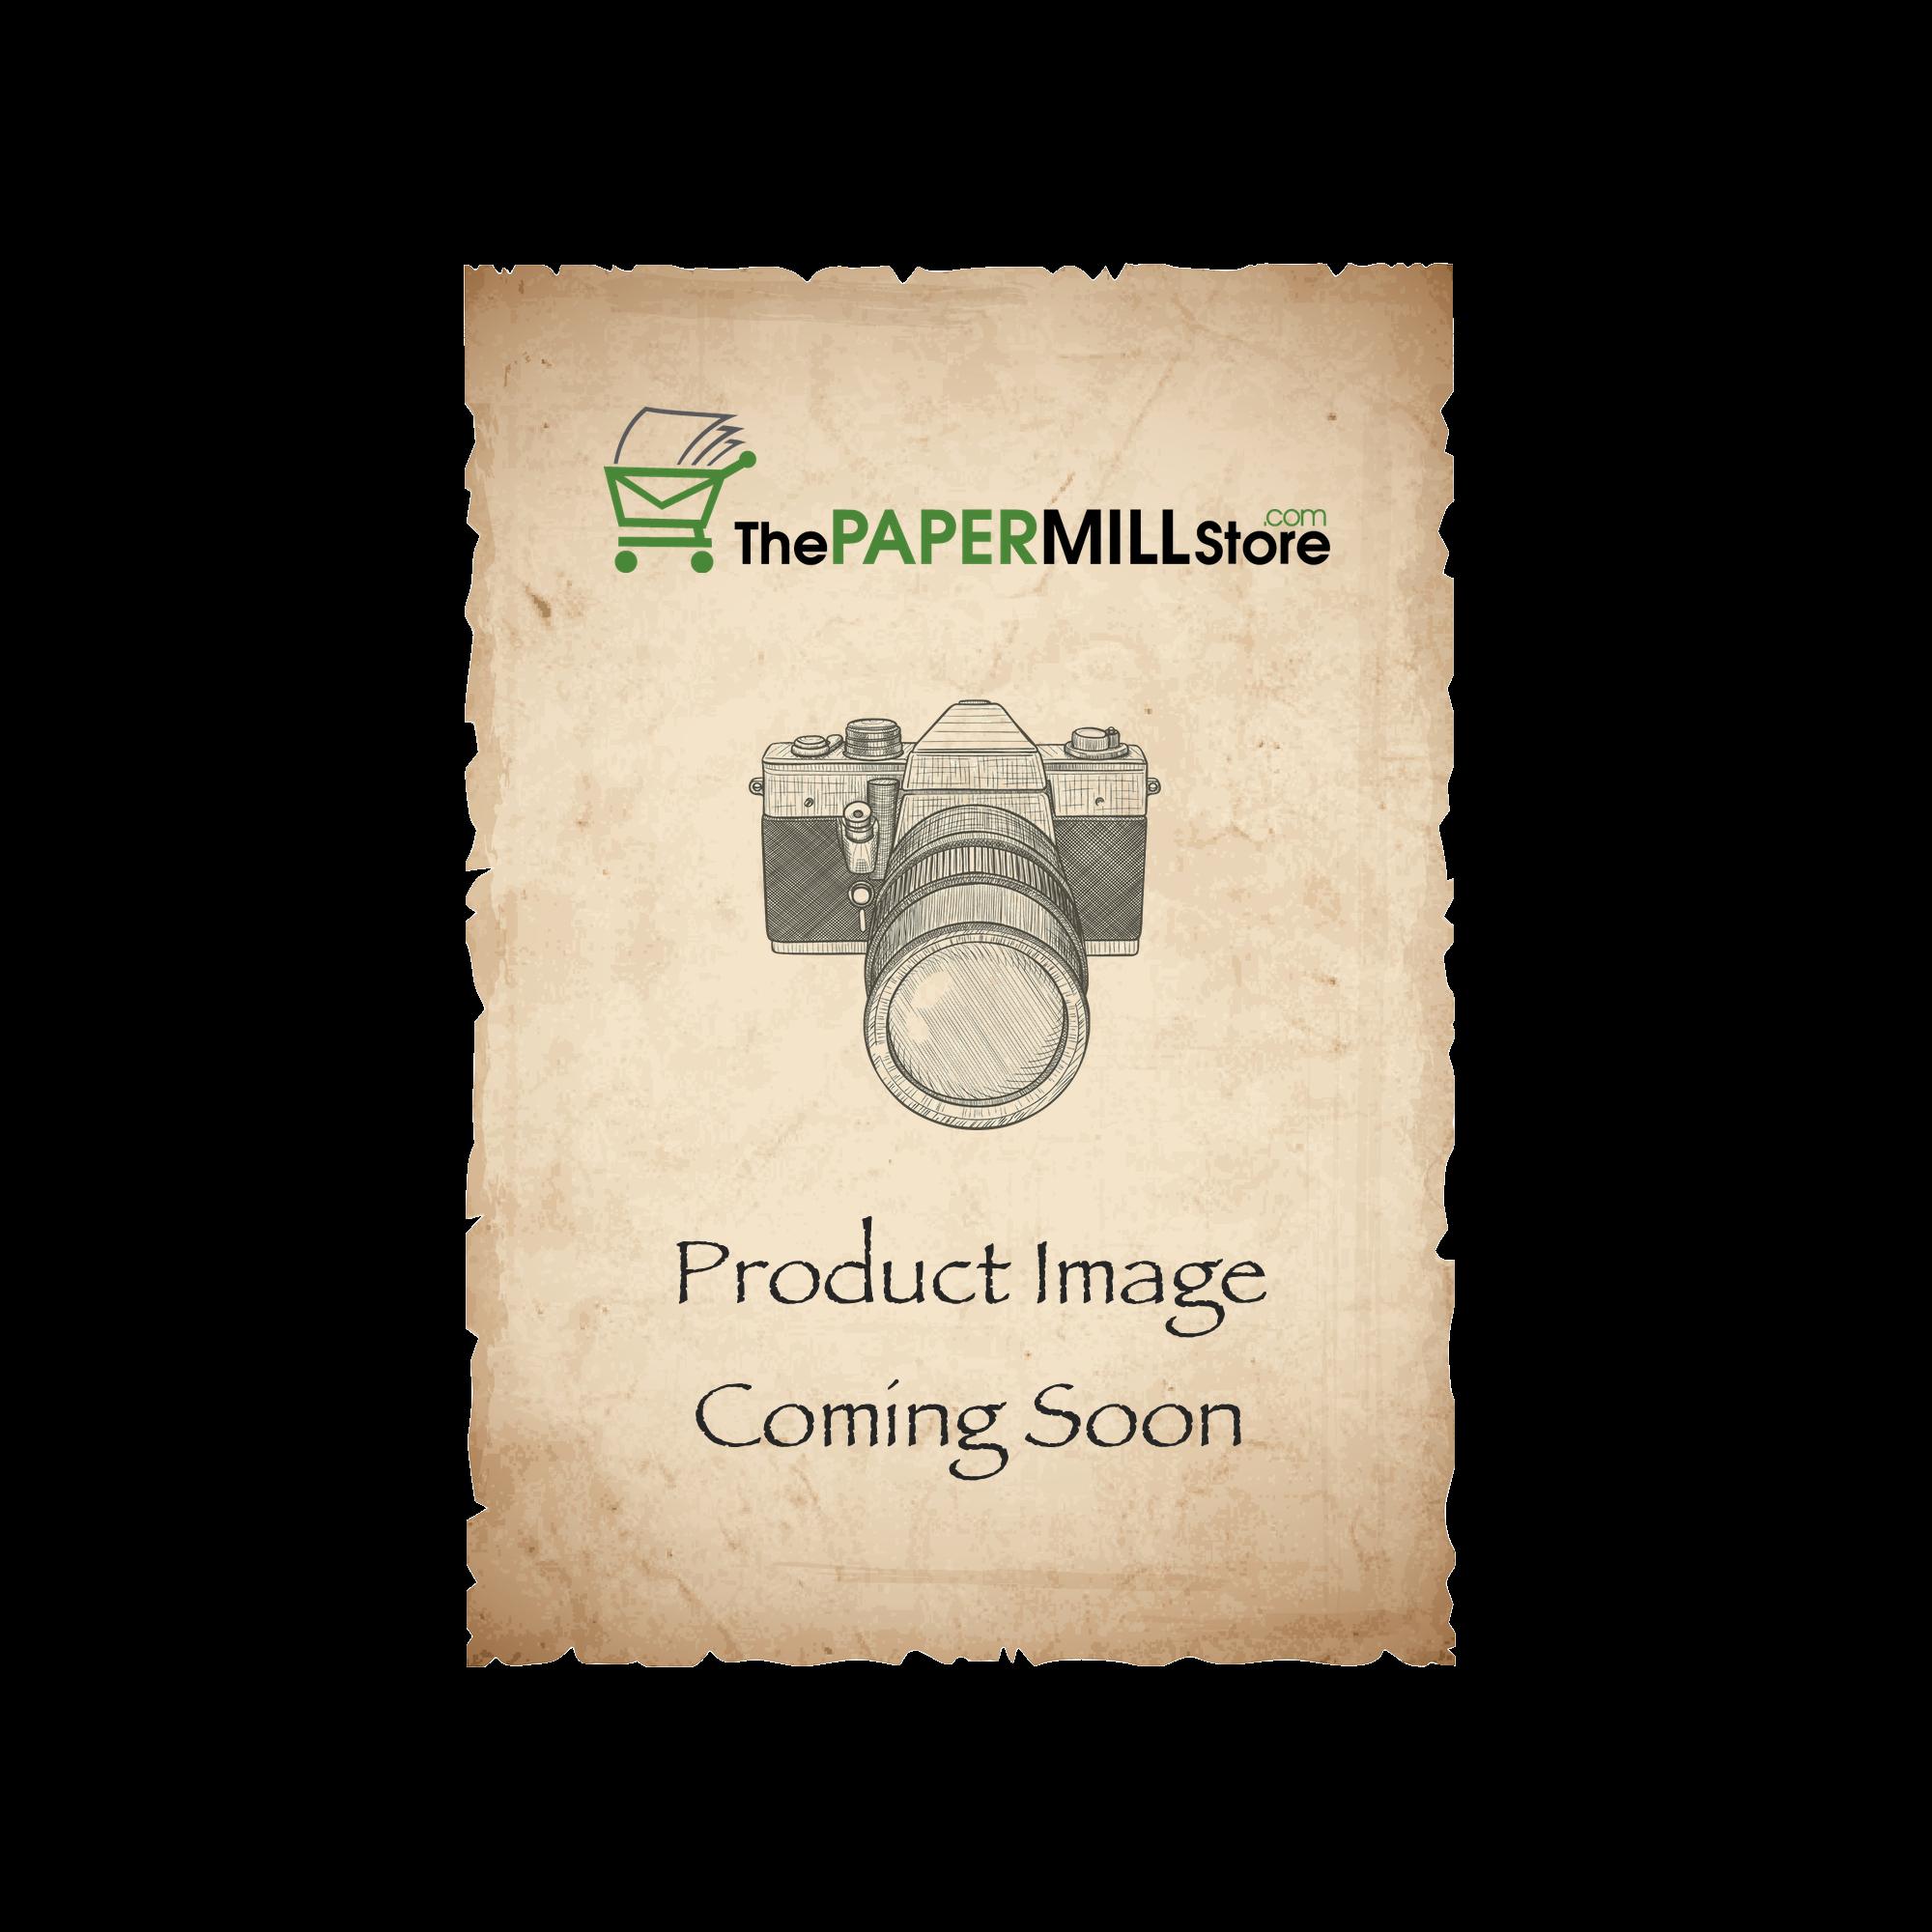 BriteHue Meadow Green Envelopes - No. 10 Commercial (4 1/8 x 9 1/2) 60 lb Text Semi-Vellum  30% Recycled 500 per Box